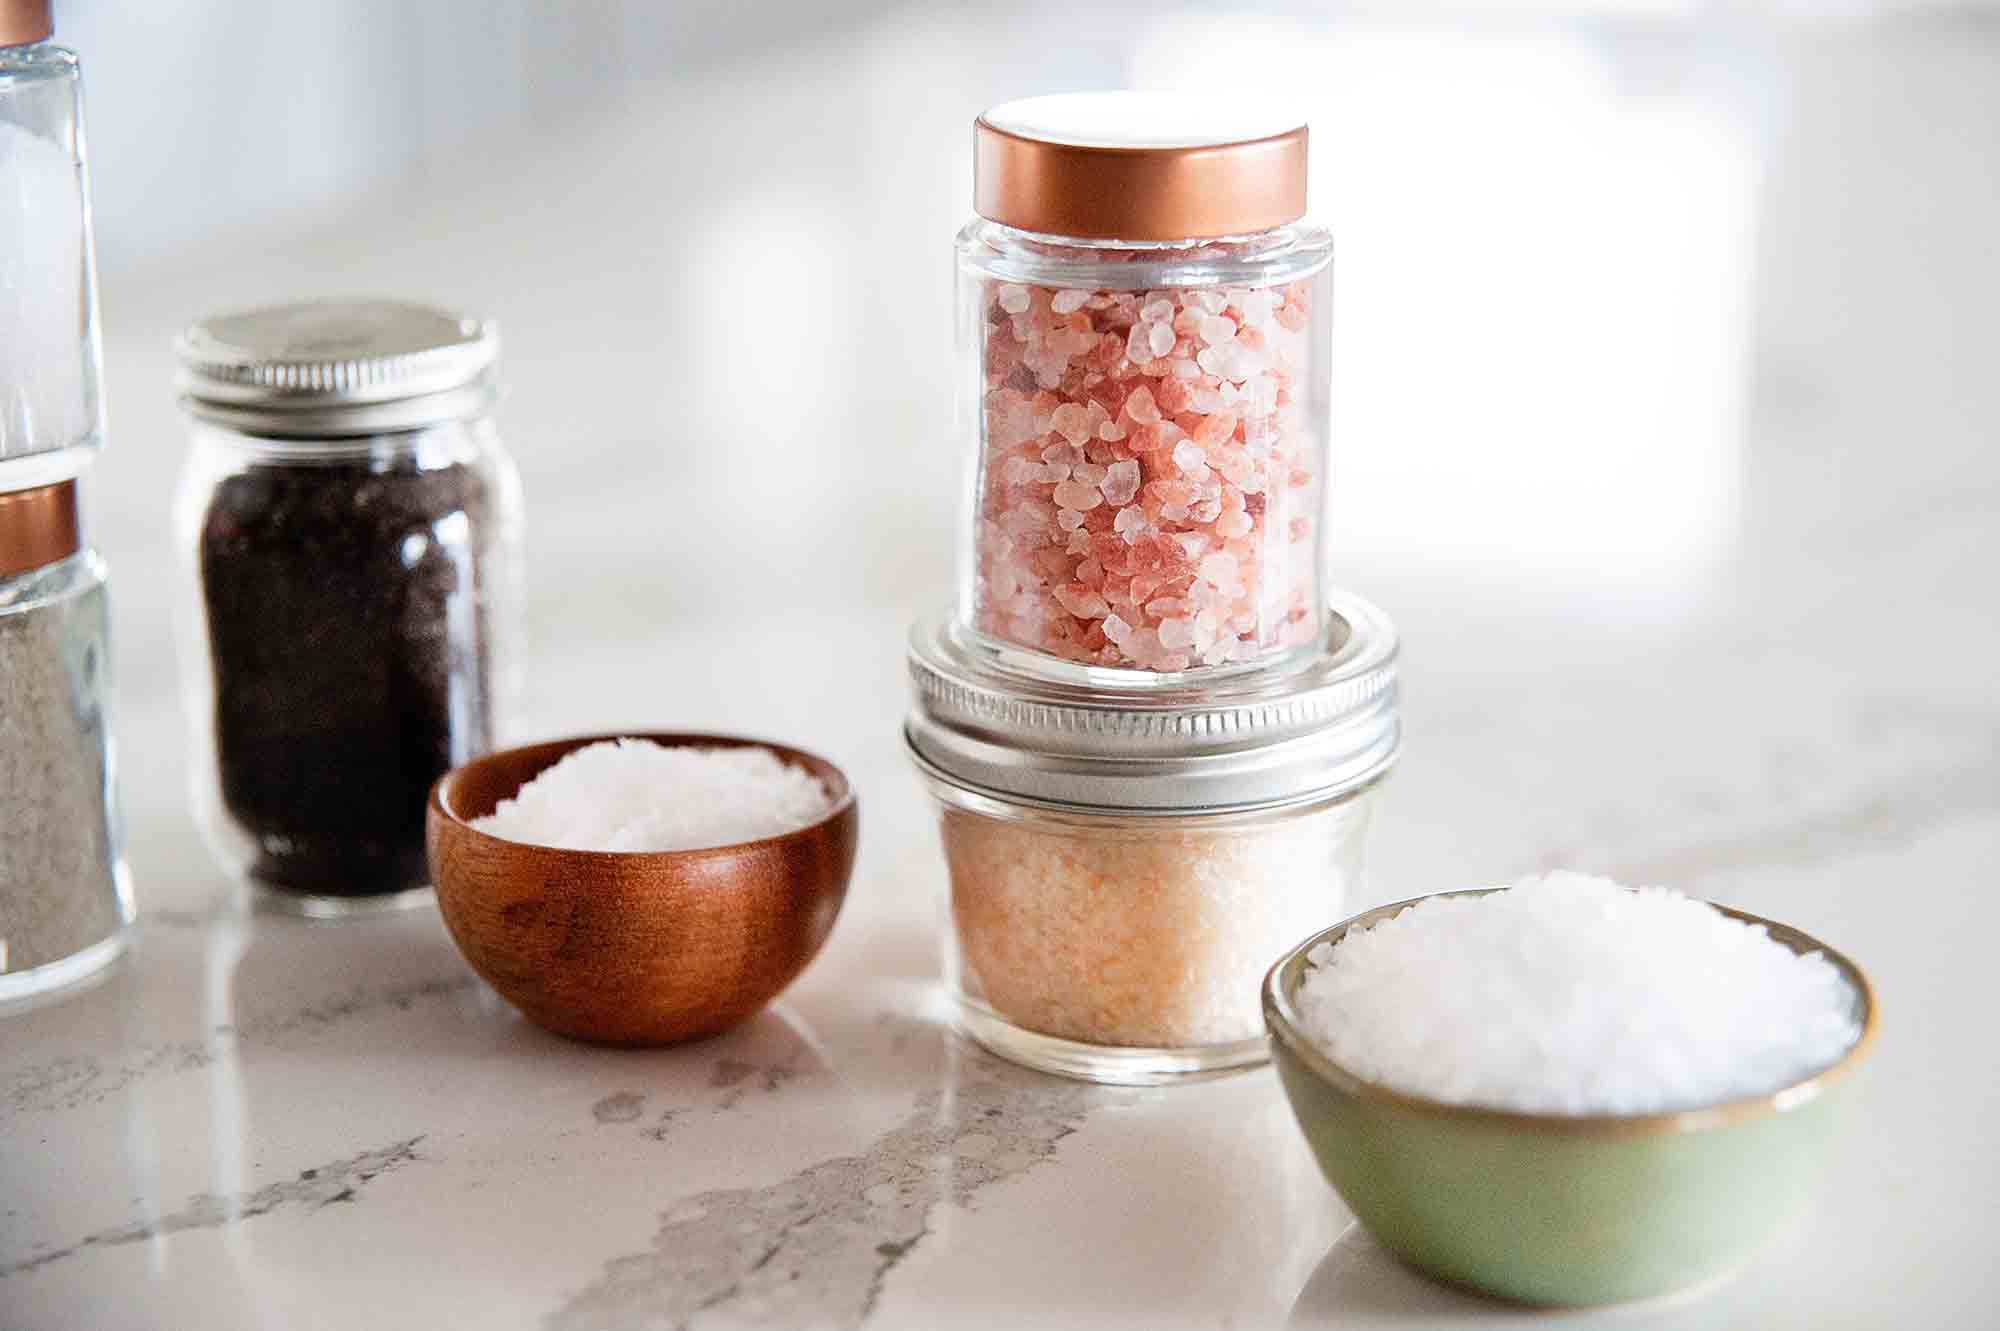 Jars and bowls of kosher salt, Himalyan salt, and smoked salt